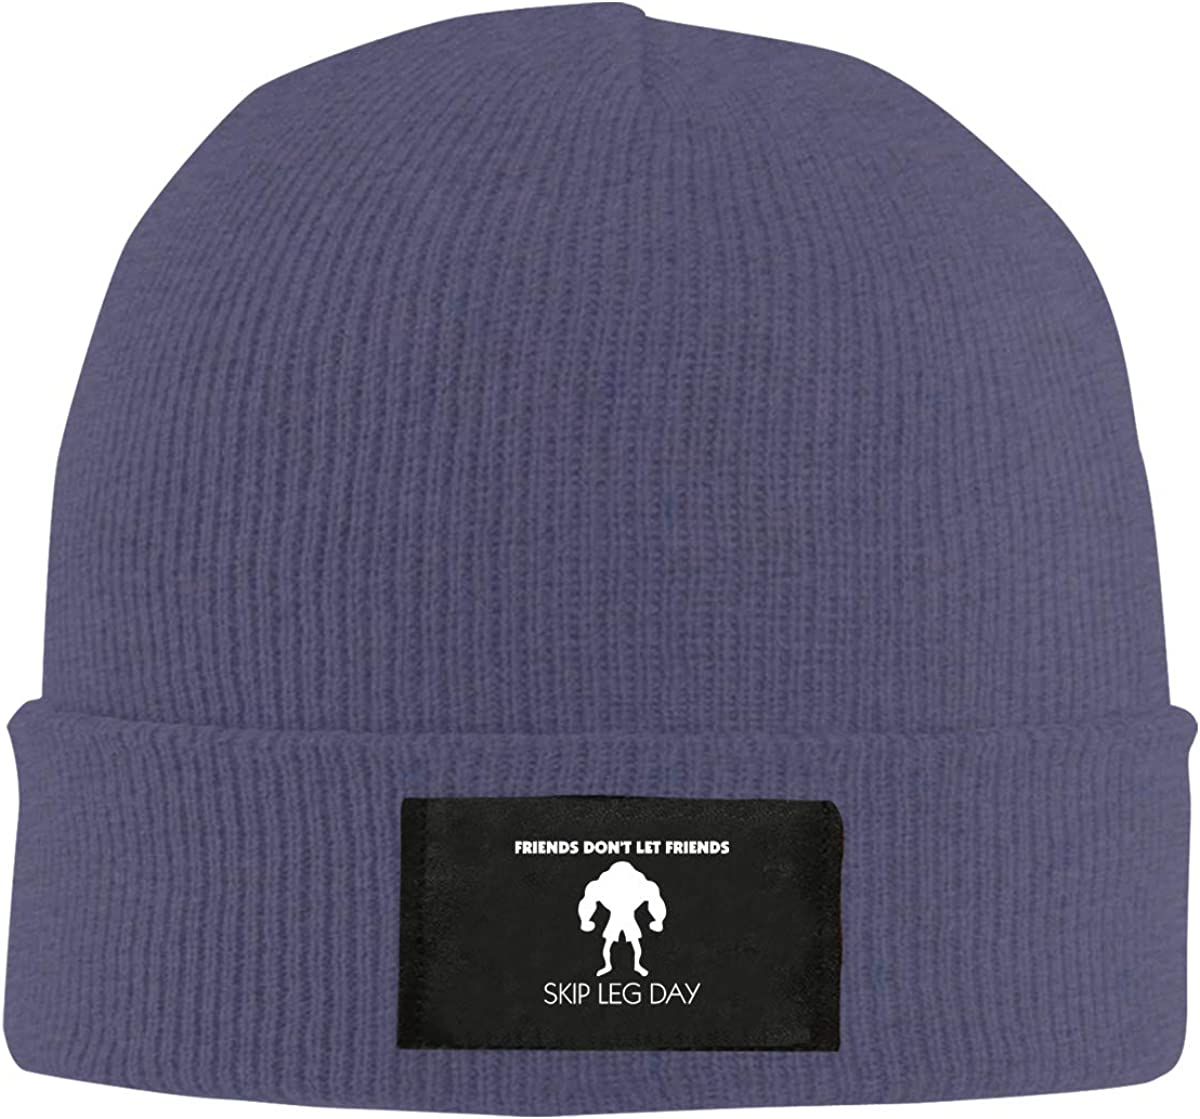 Xdinfong Friends Dont Let Friends Skip Leg Day Winter Beanie Hat Knit Hat Cap for Men /& Women